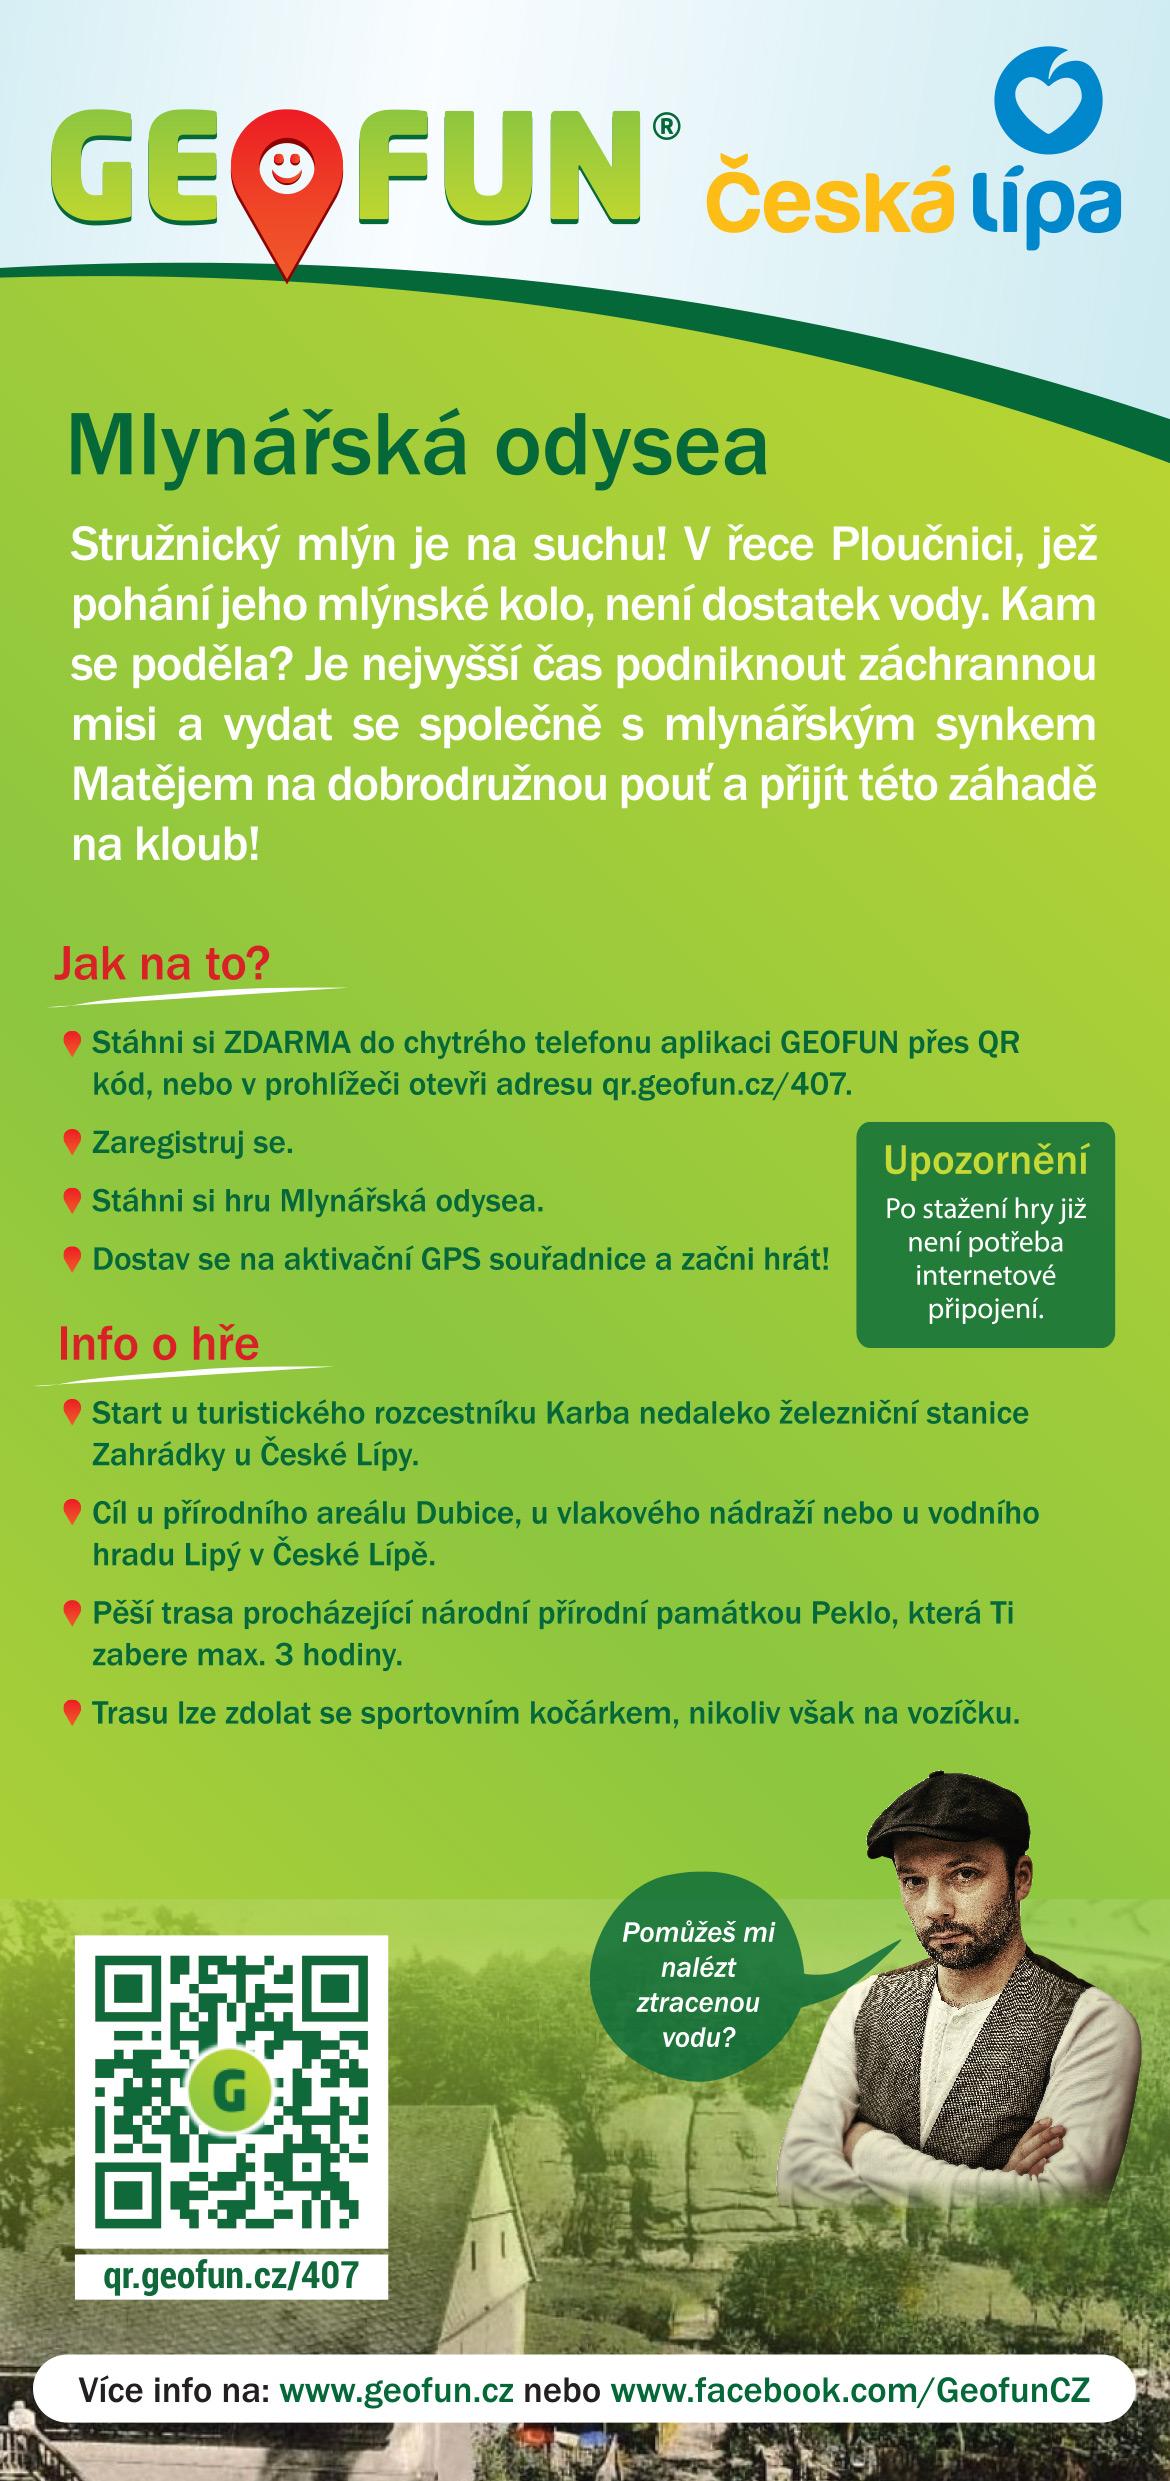 mlynarska-odysea-cz